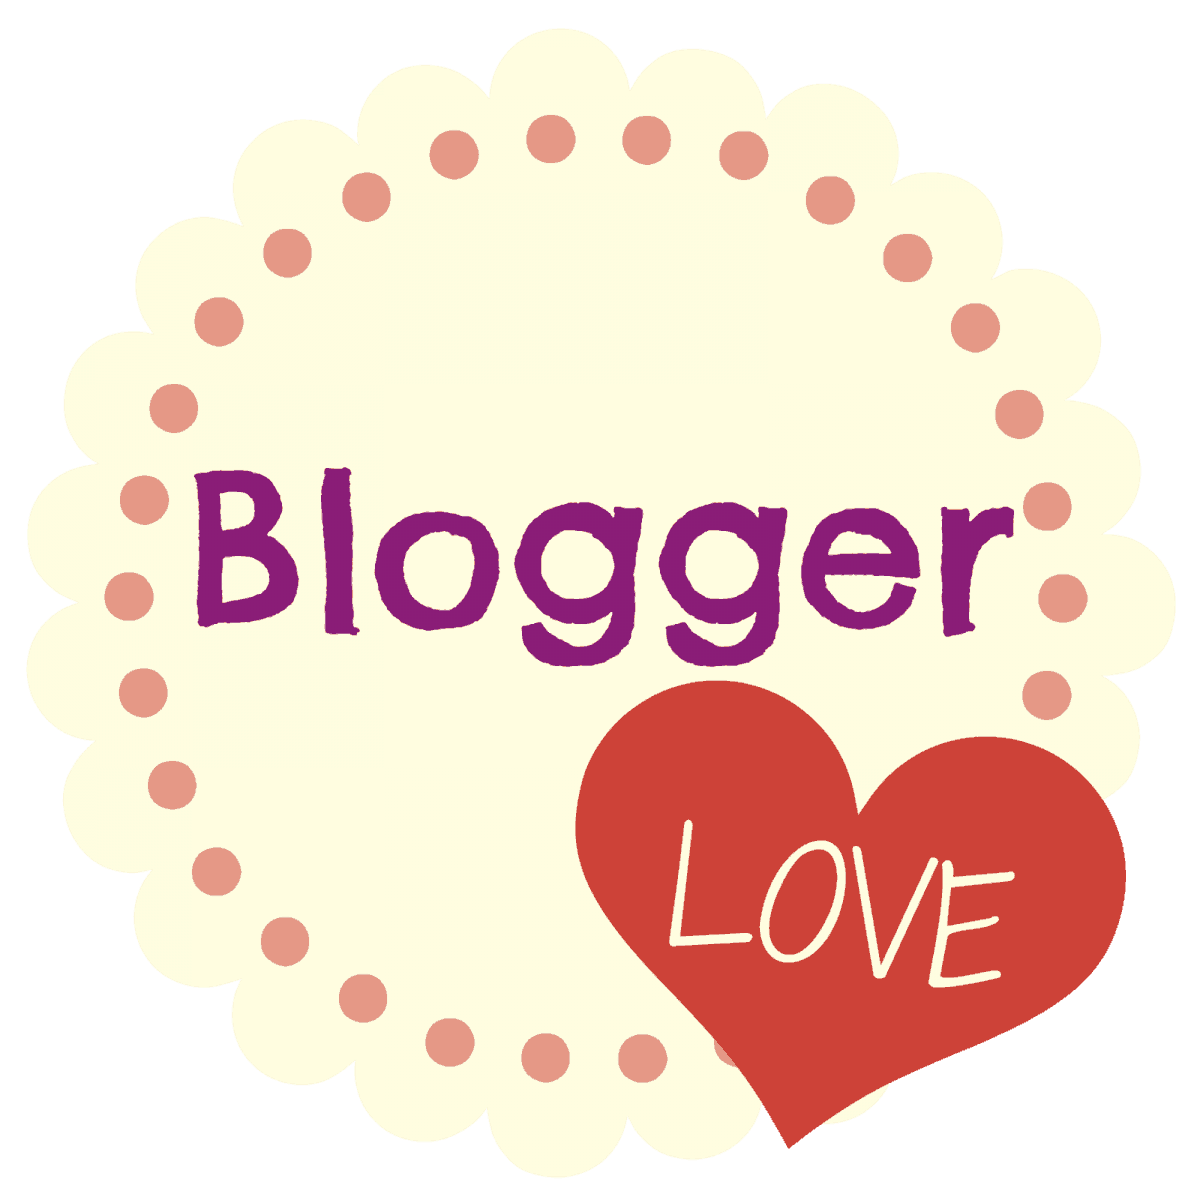 Blogger Love, Bloglovin' Style